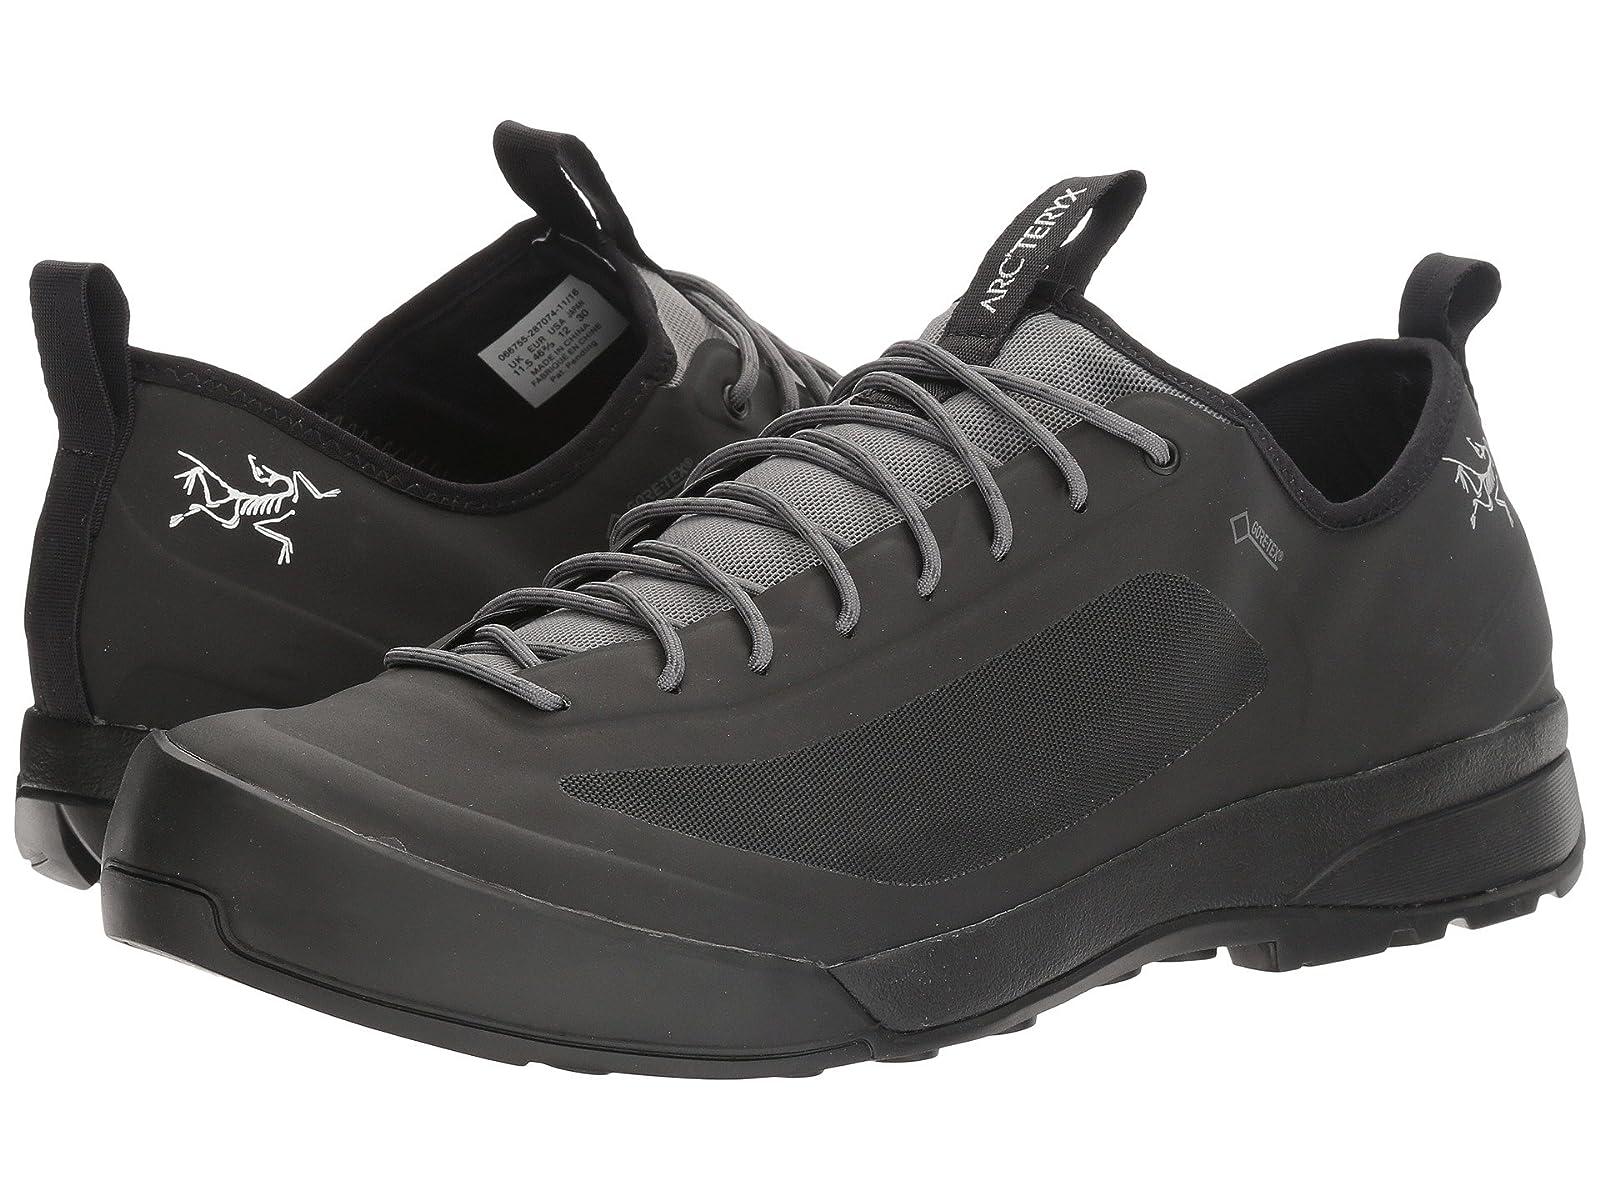 Arc'teryx Acrux SL GTX ApproachAtmospheric grades have affordable shoes